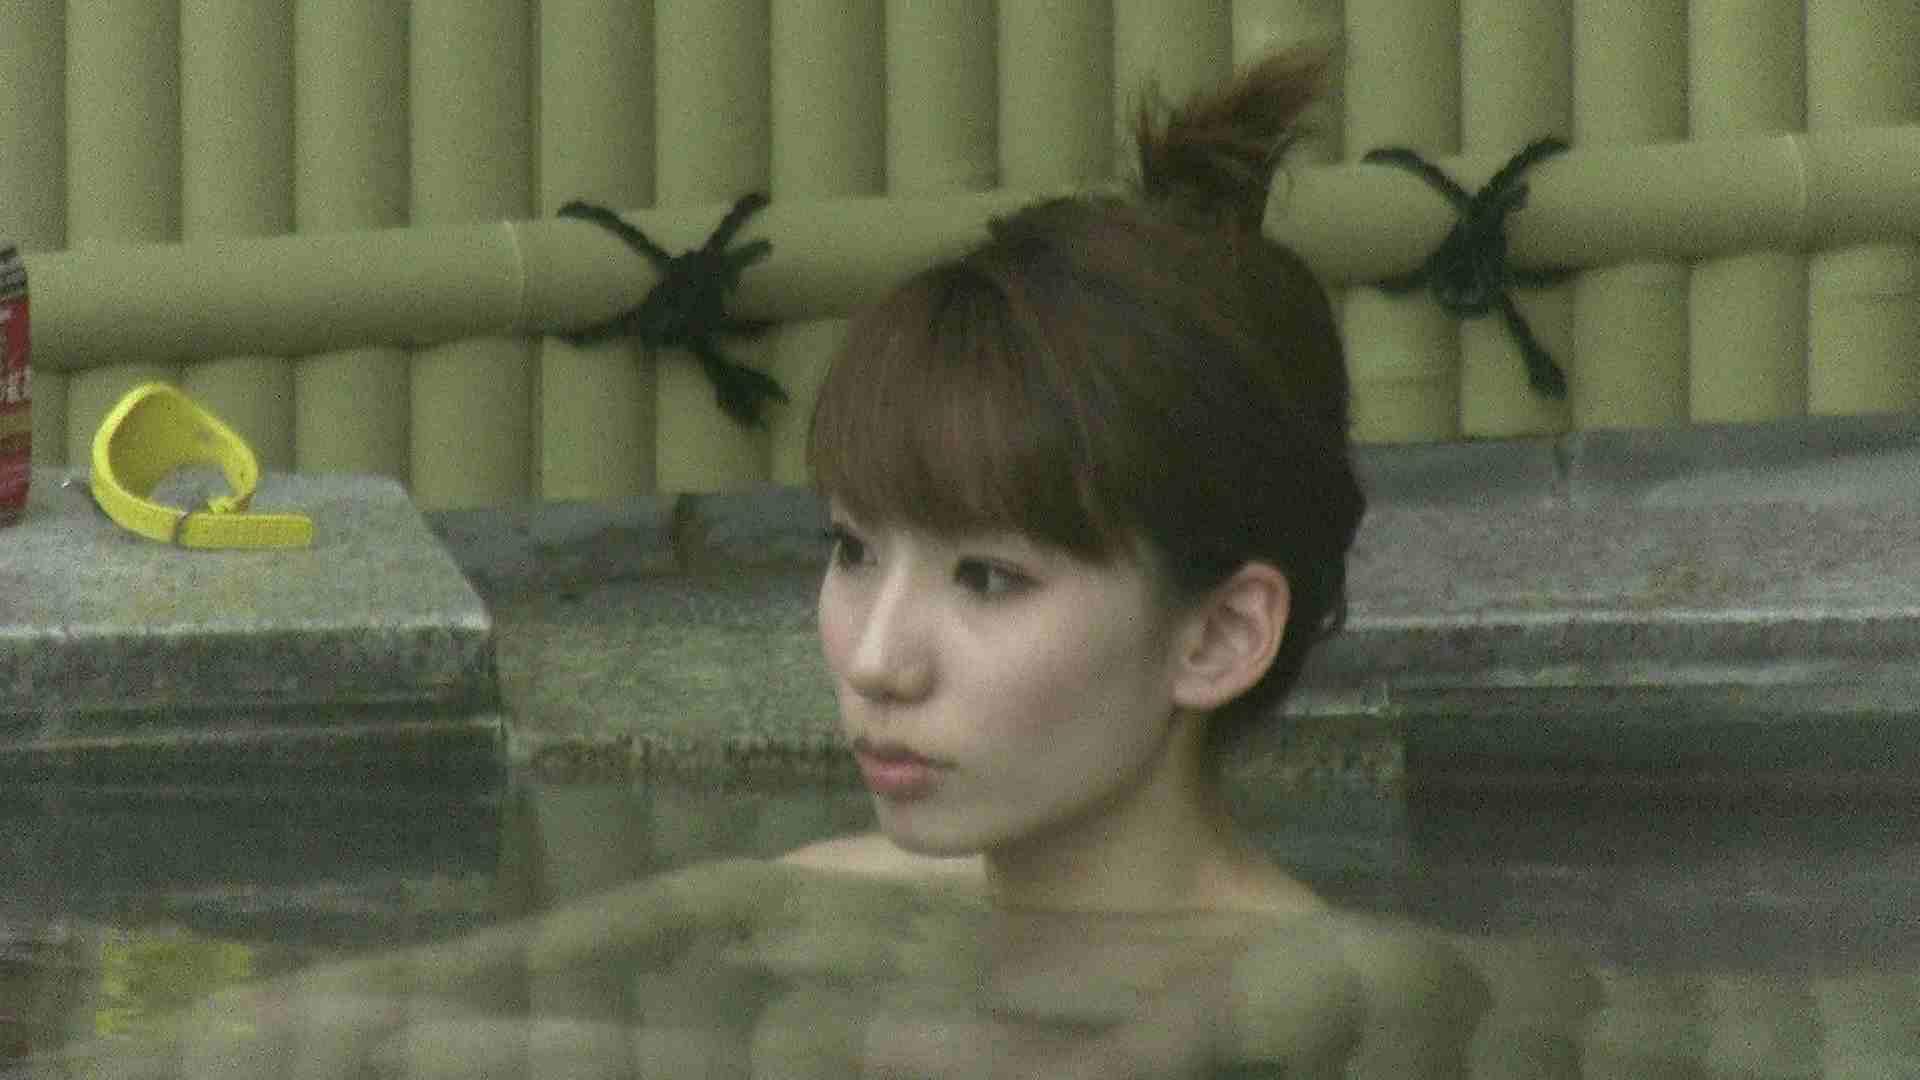 Aquaな露天風呂Vol.208 盗撮 隠し撮りオマンコ動画紹介 85画像 29